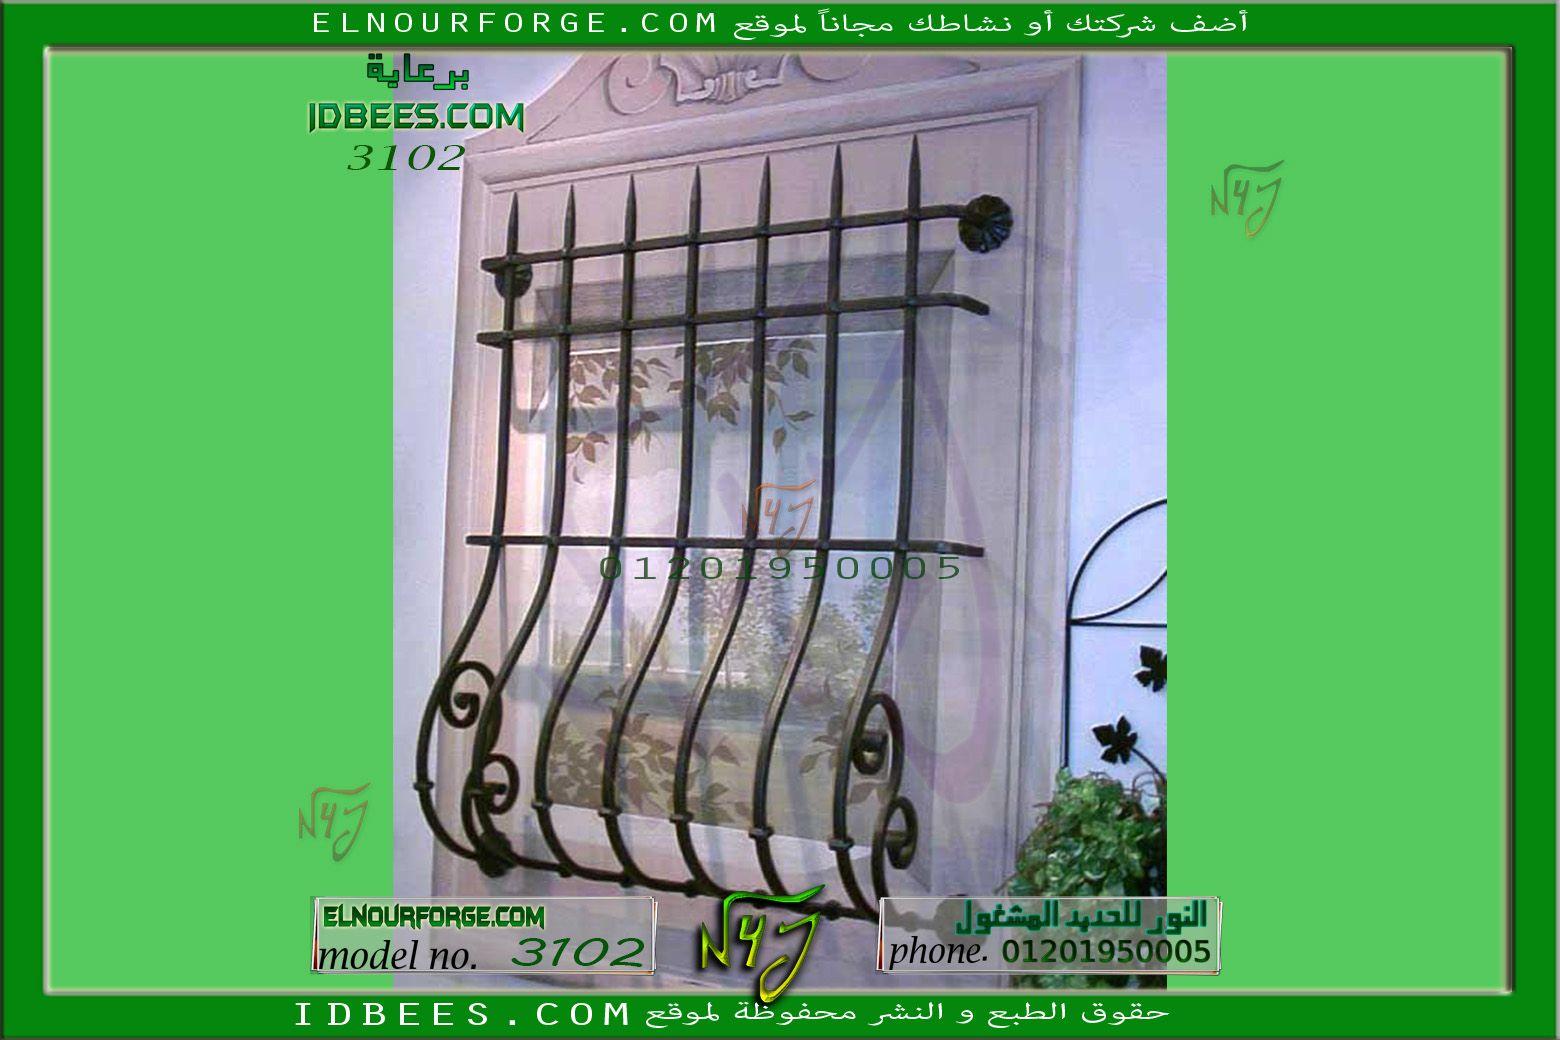 3102 Window Wrought Iron نوافذ شبابيك حديد مشغول Balcony Grill Design Grill Design Balcony Grill